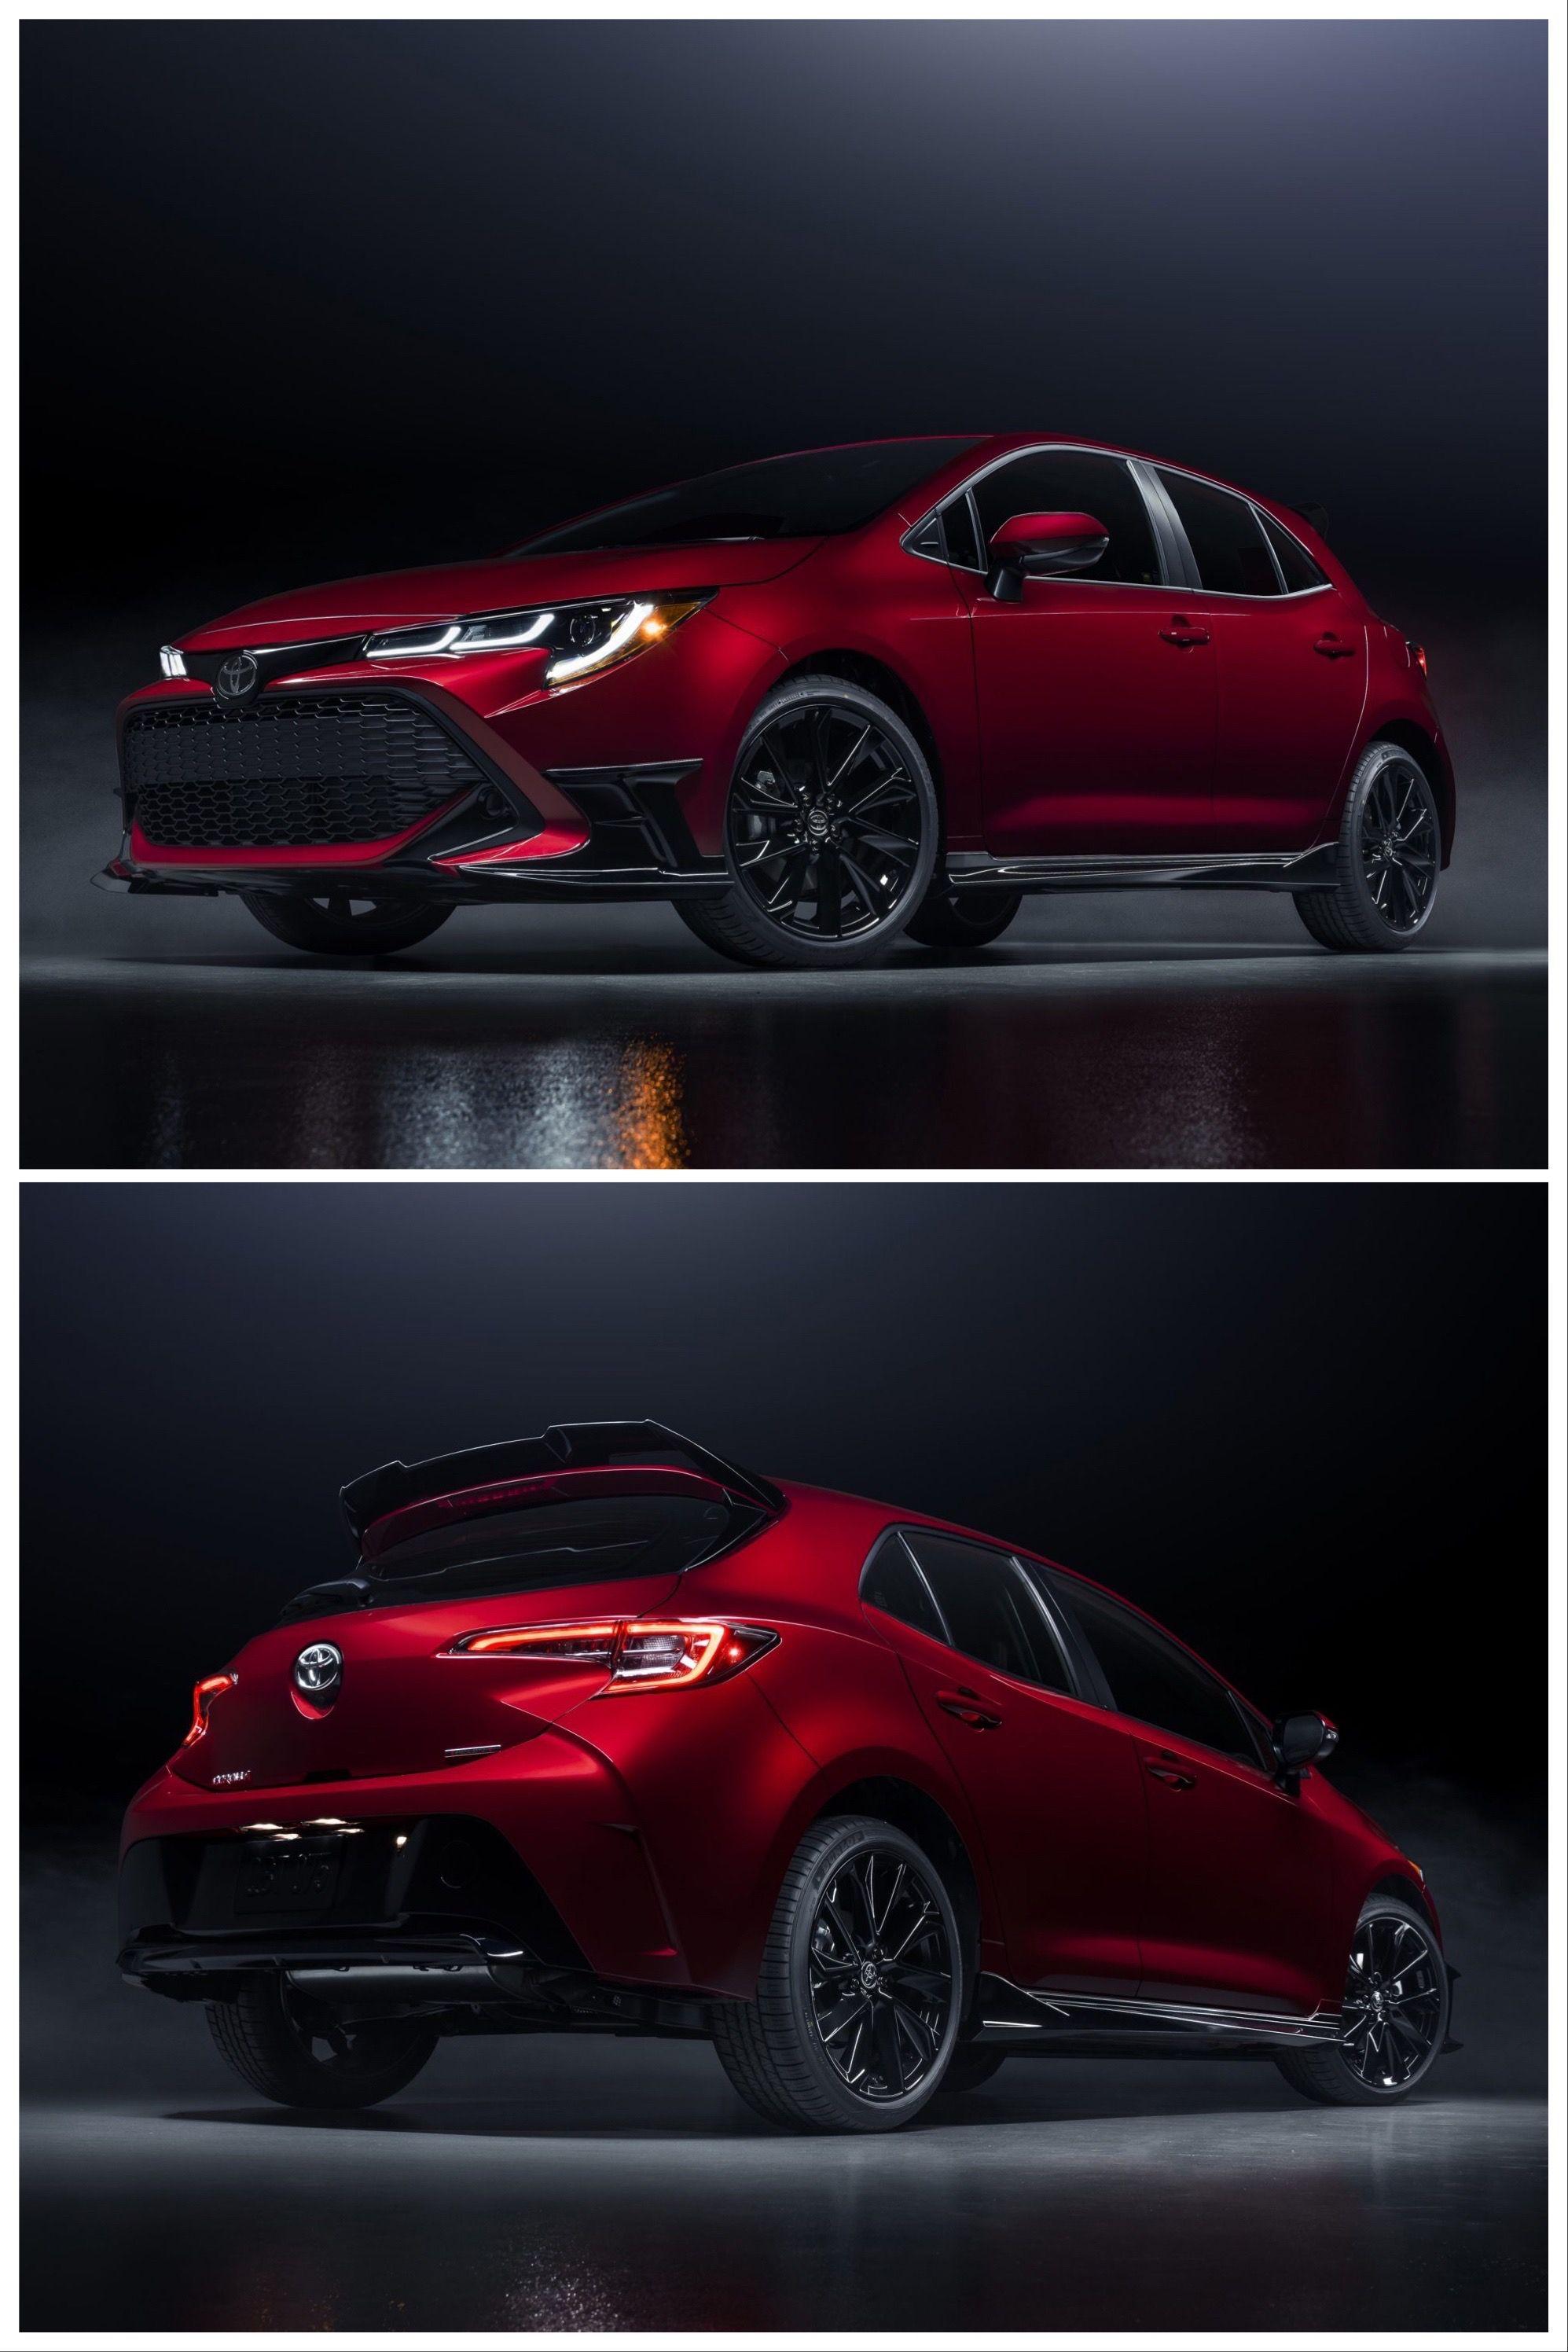 2021 Toyota Corolla Hatchback Images